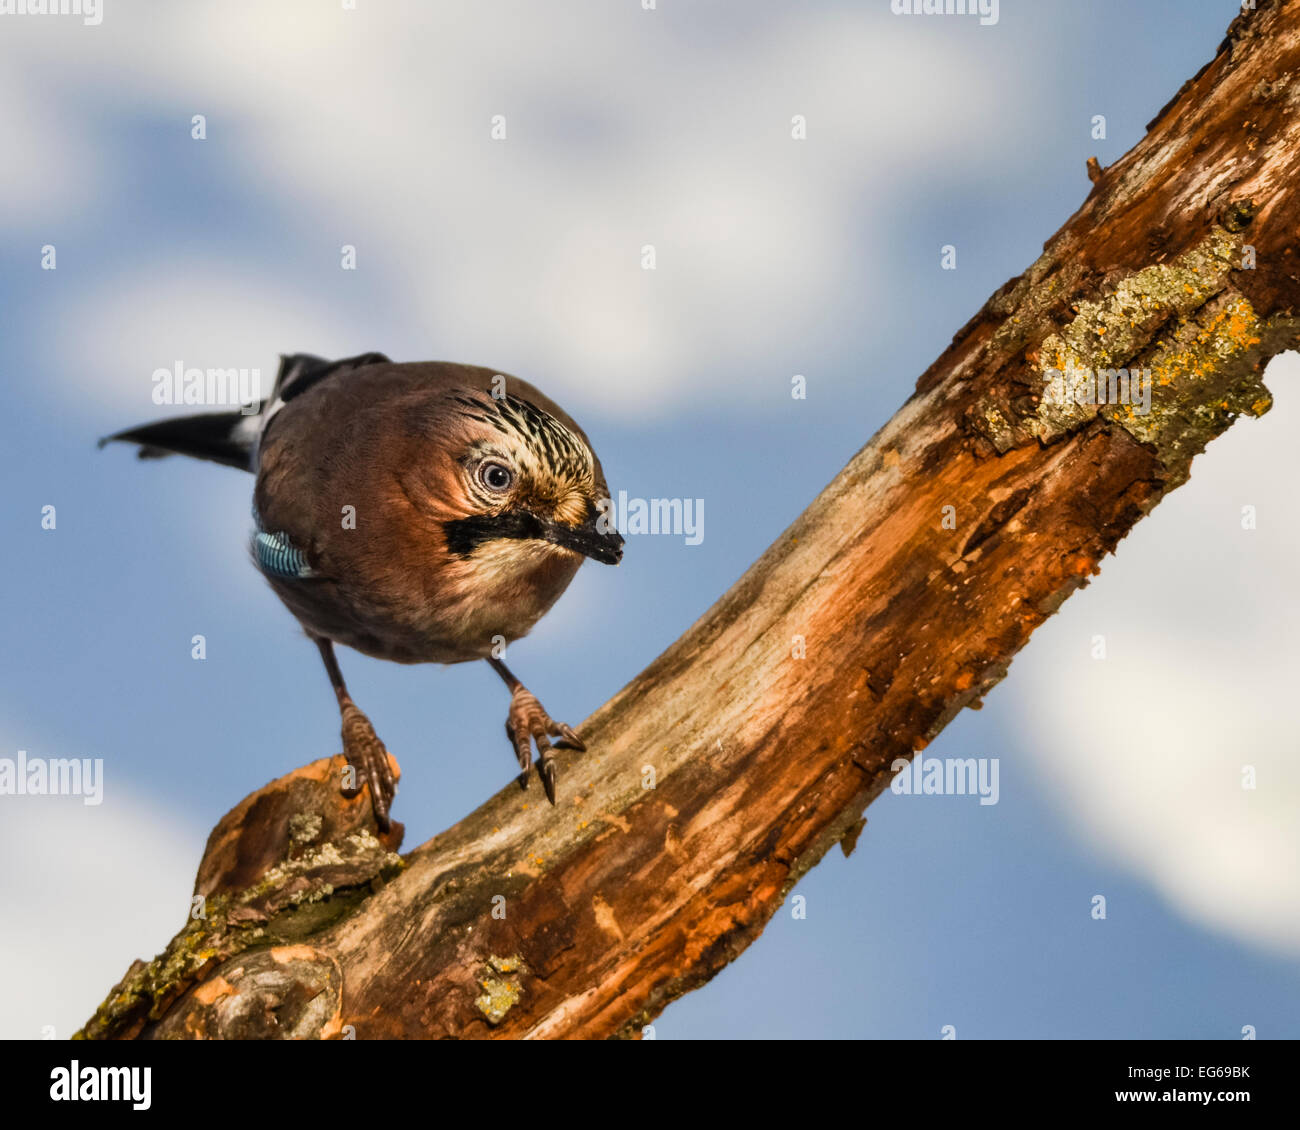 Jay bird (Garrulus glandarius) on a twig with curious look. - Stock Image